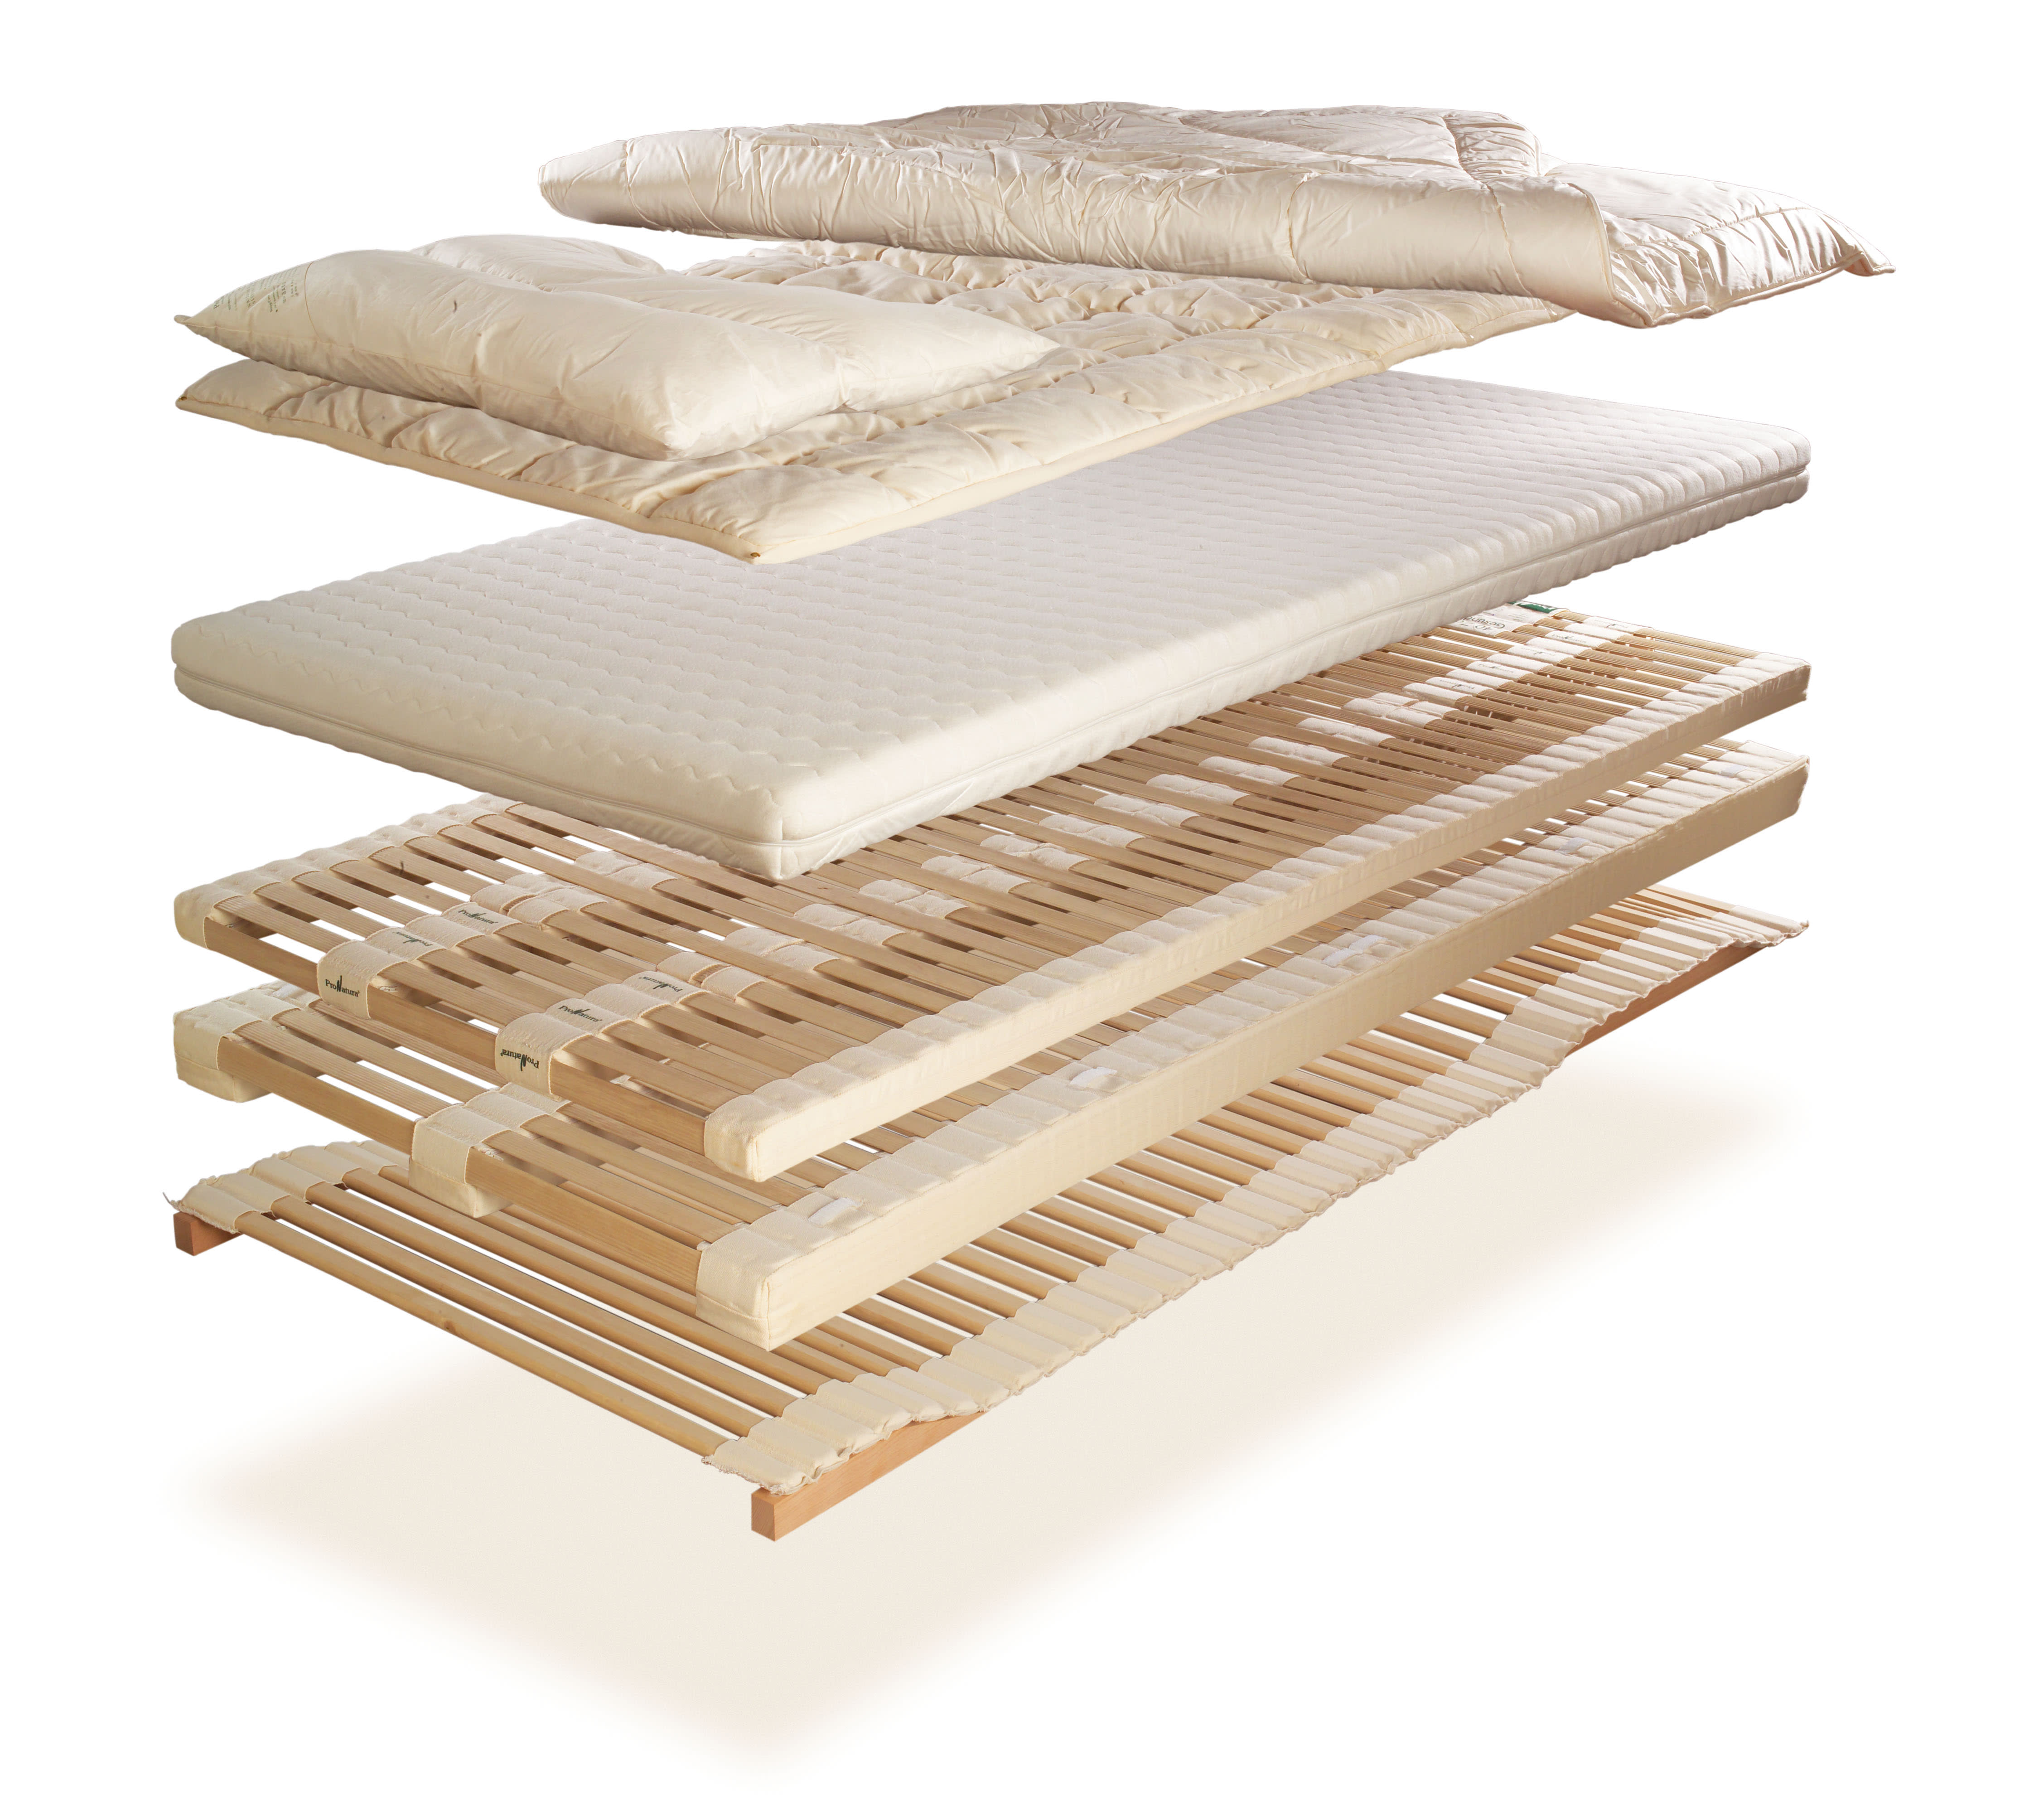 ProNatura Bett Schlafsystem Aufbau